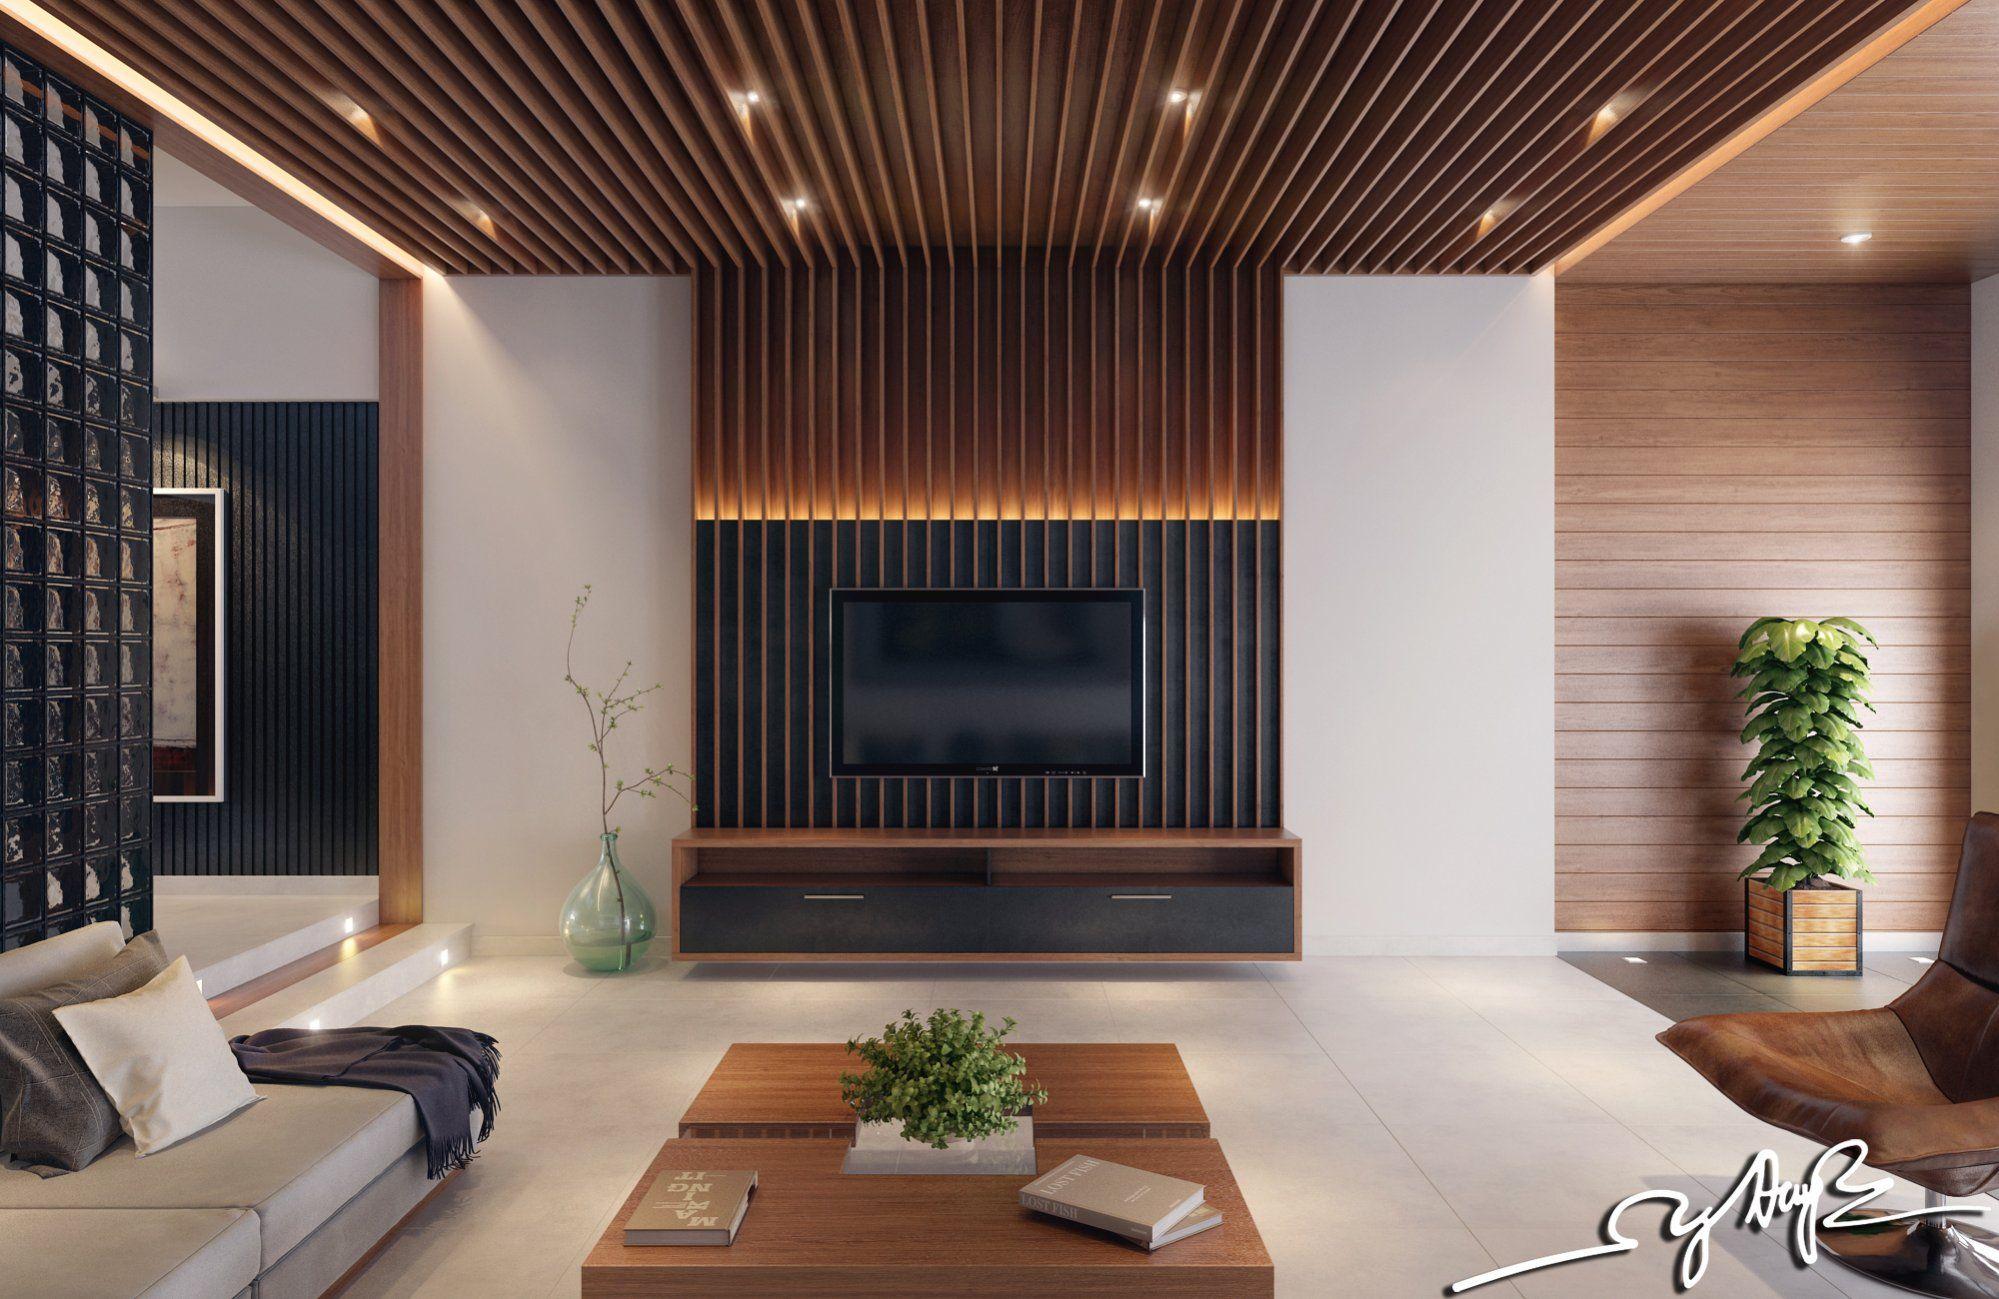 Interior Design Close To Nature Rich Wood Themes And Indoor Vertical Gardens Design De Casa Sala De Design Design De Sala De Estar